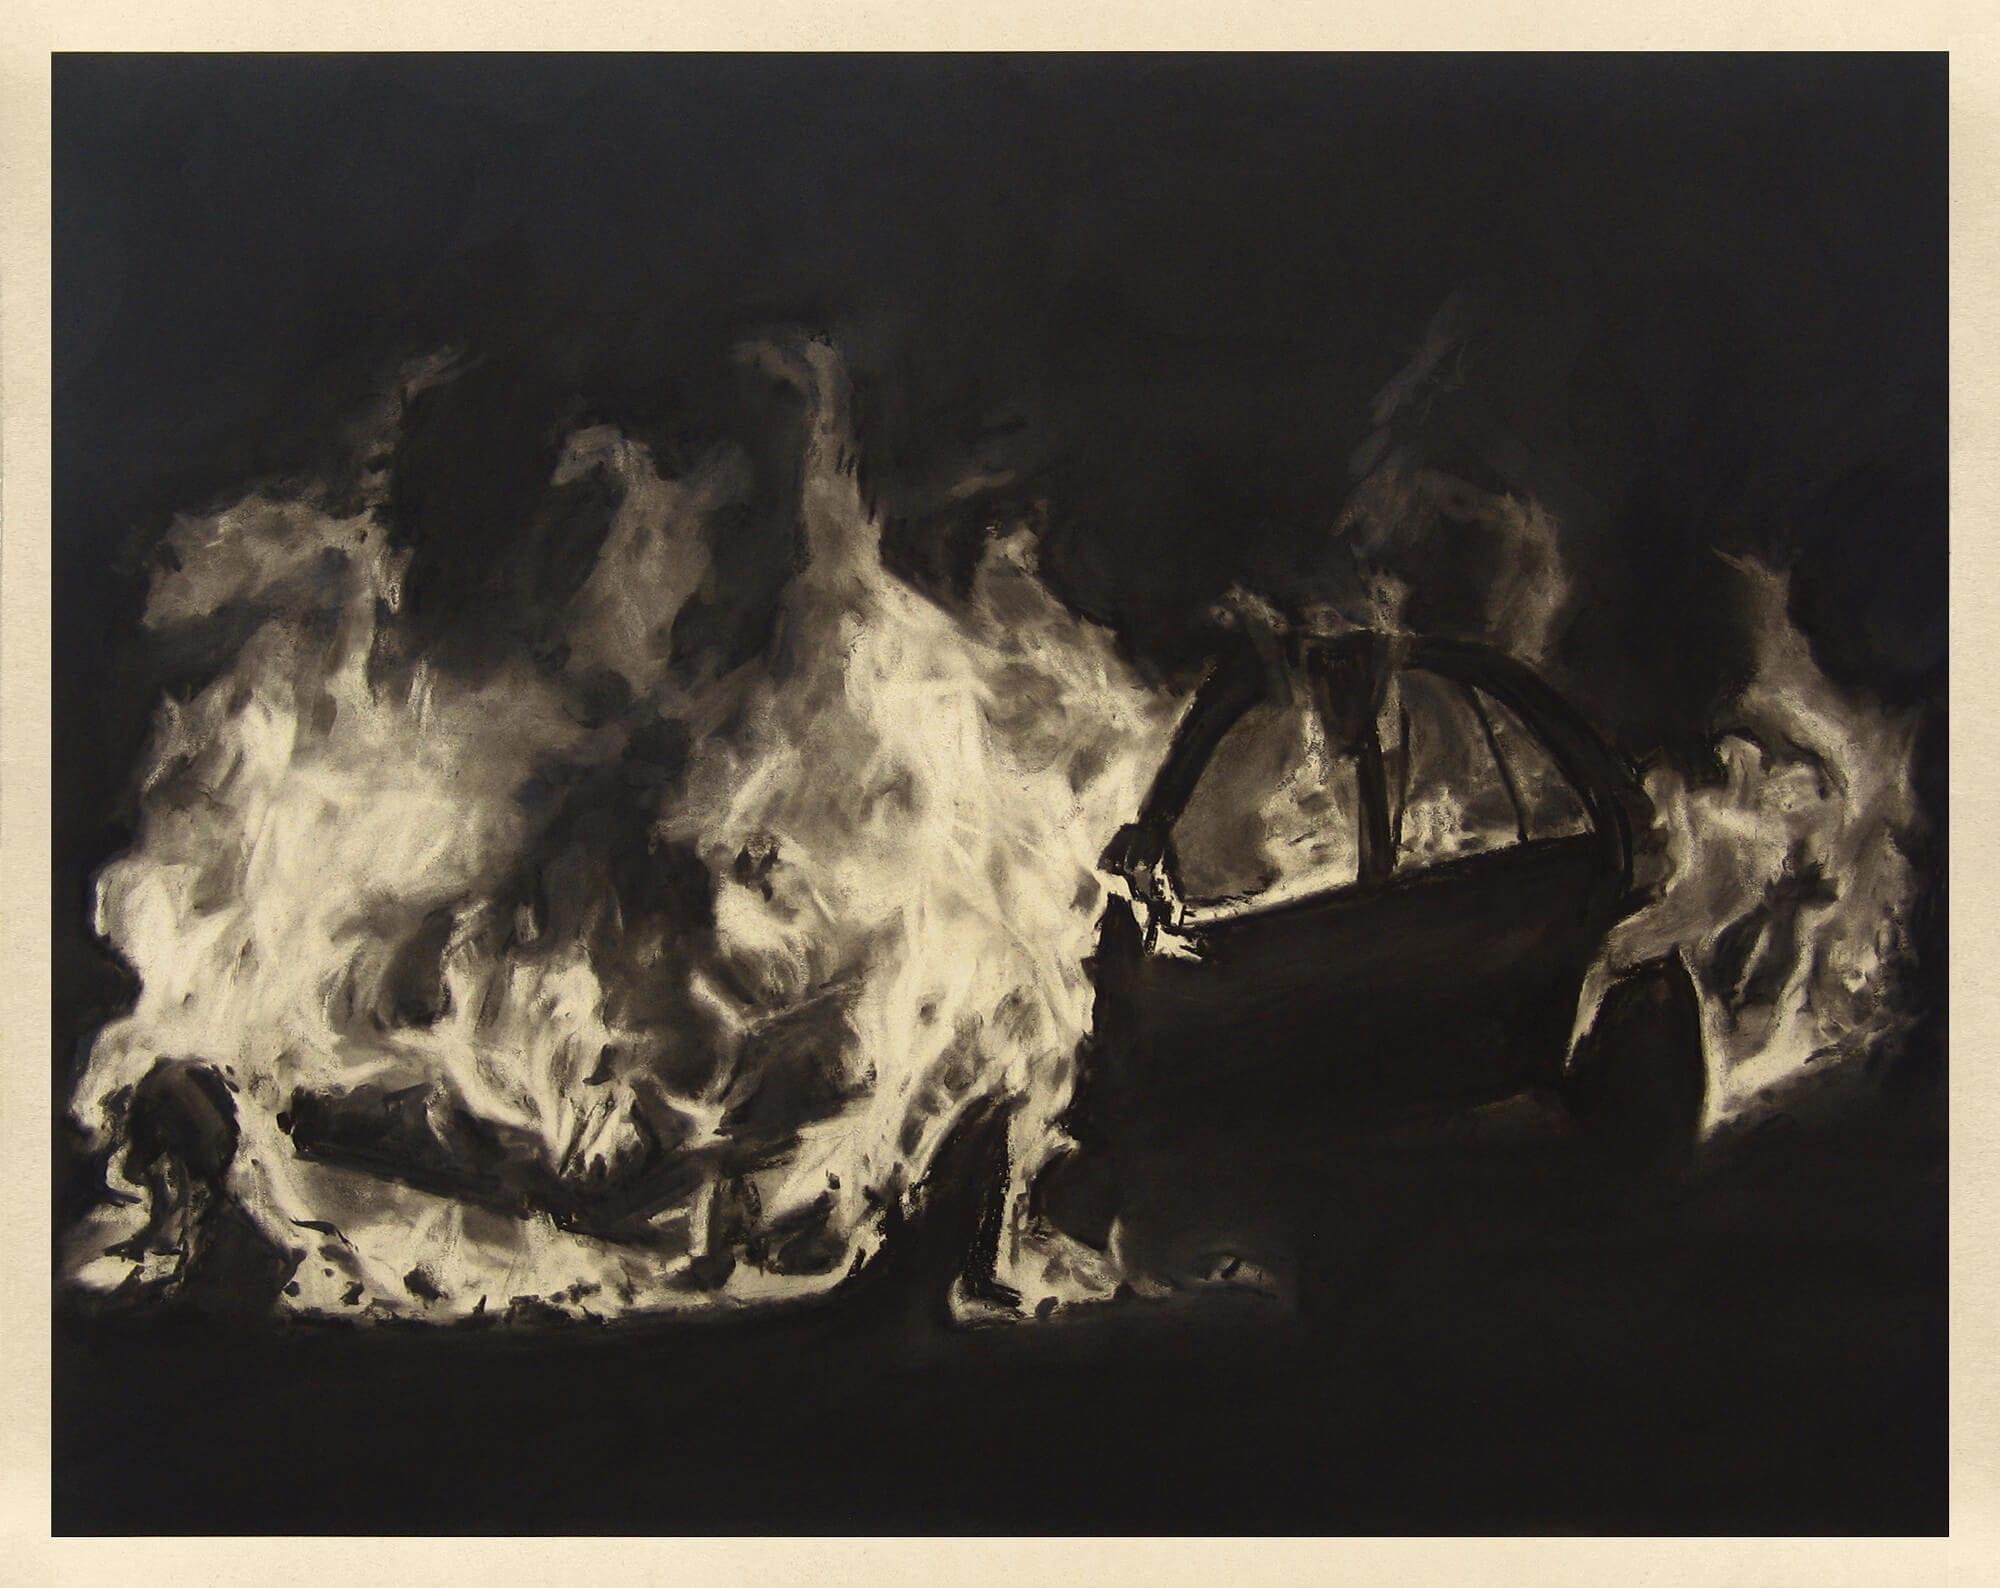 Toni Giró, Revelacions, núm.11 (2013)